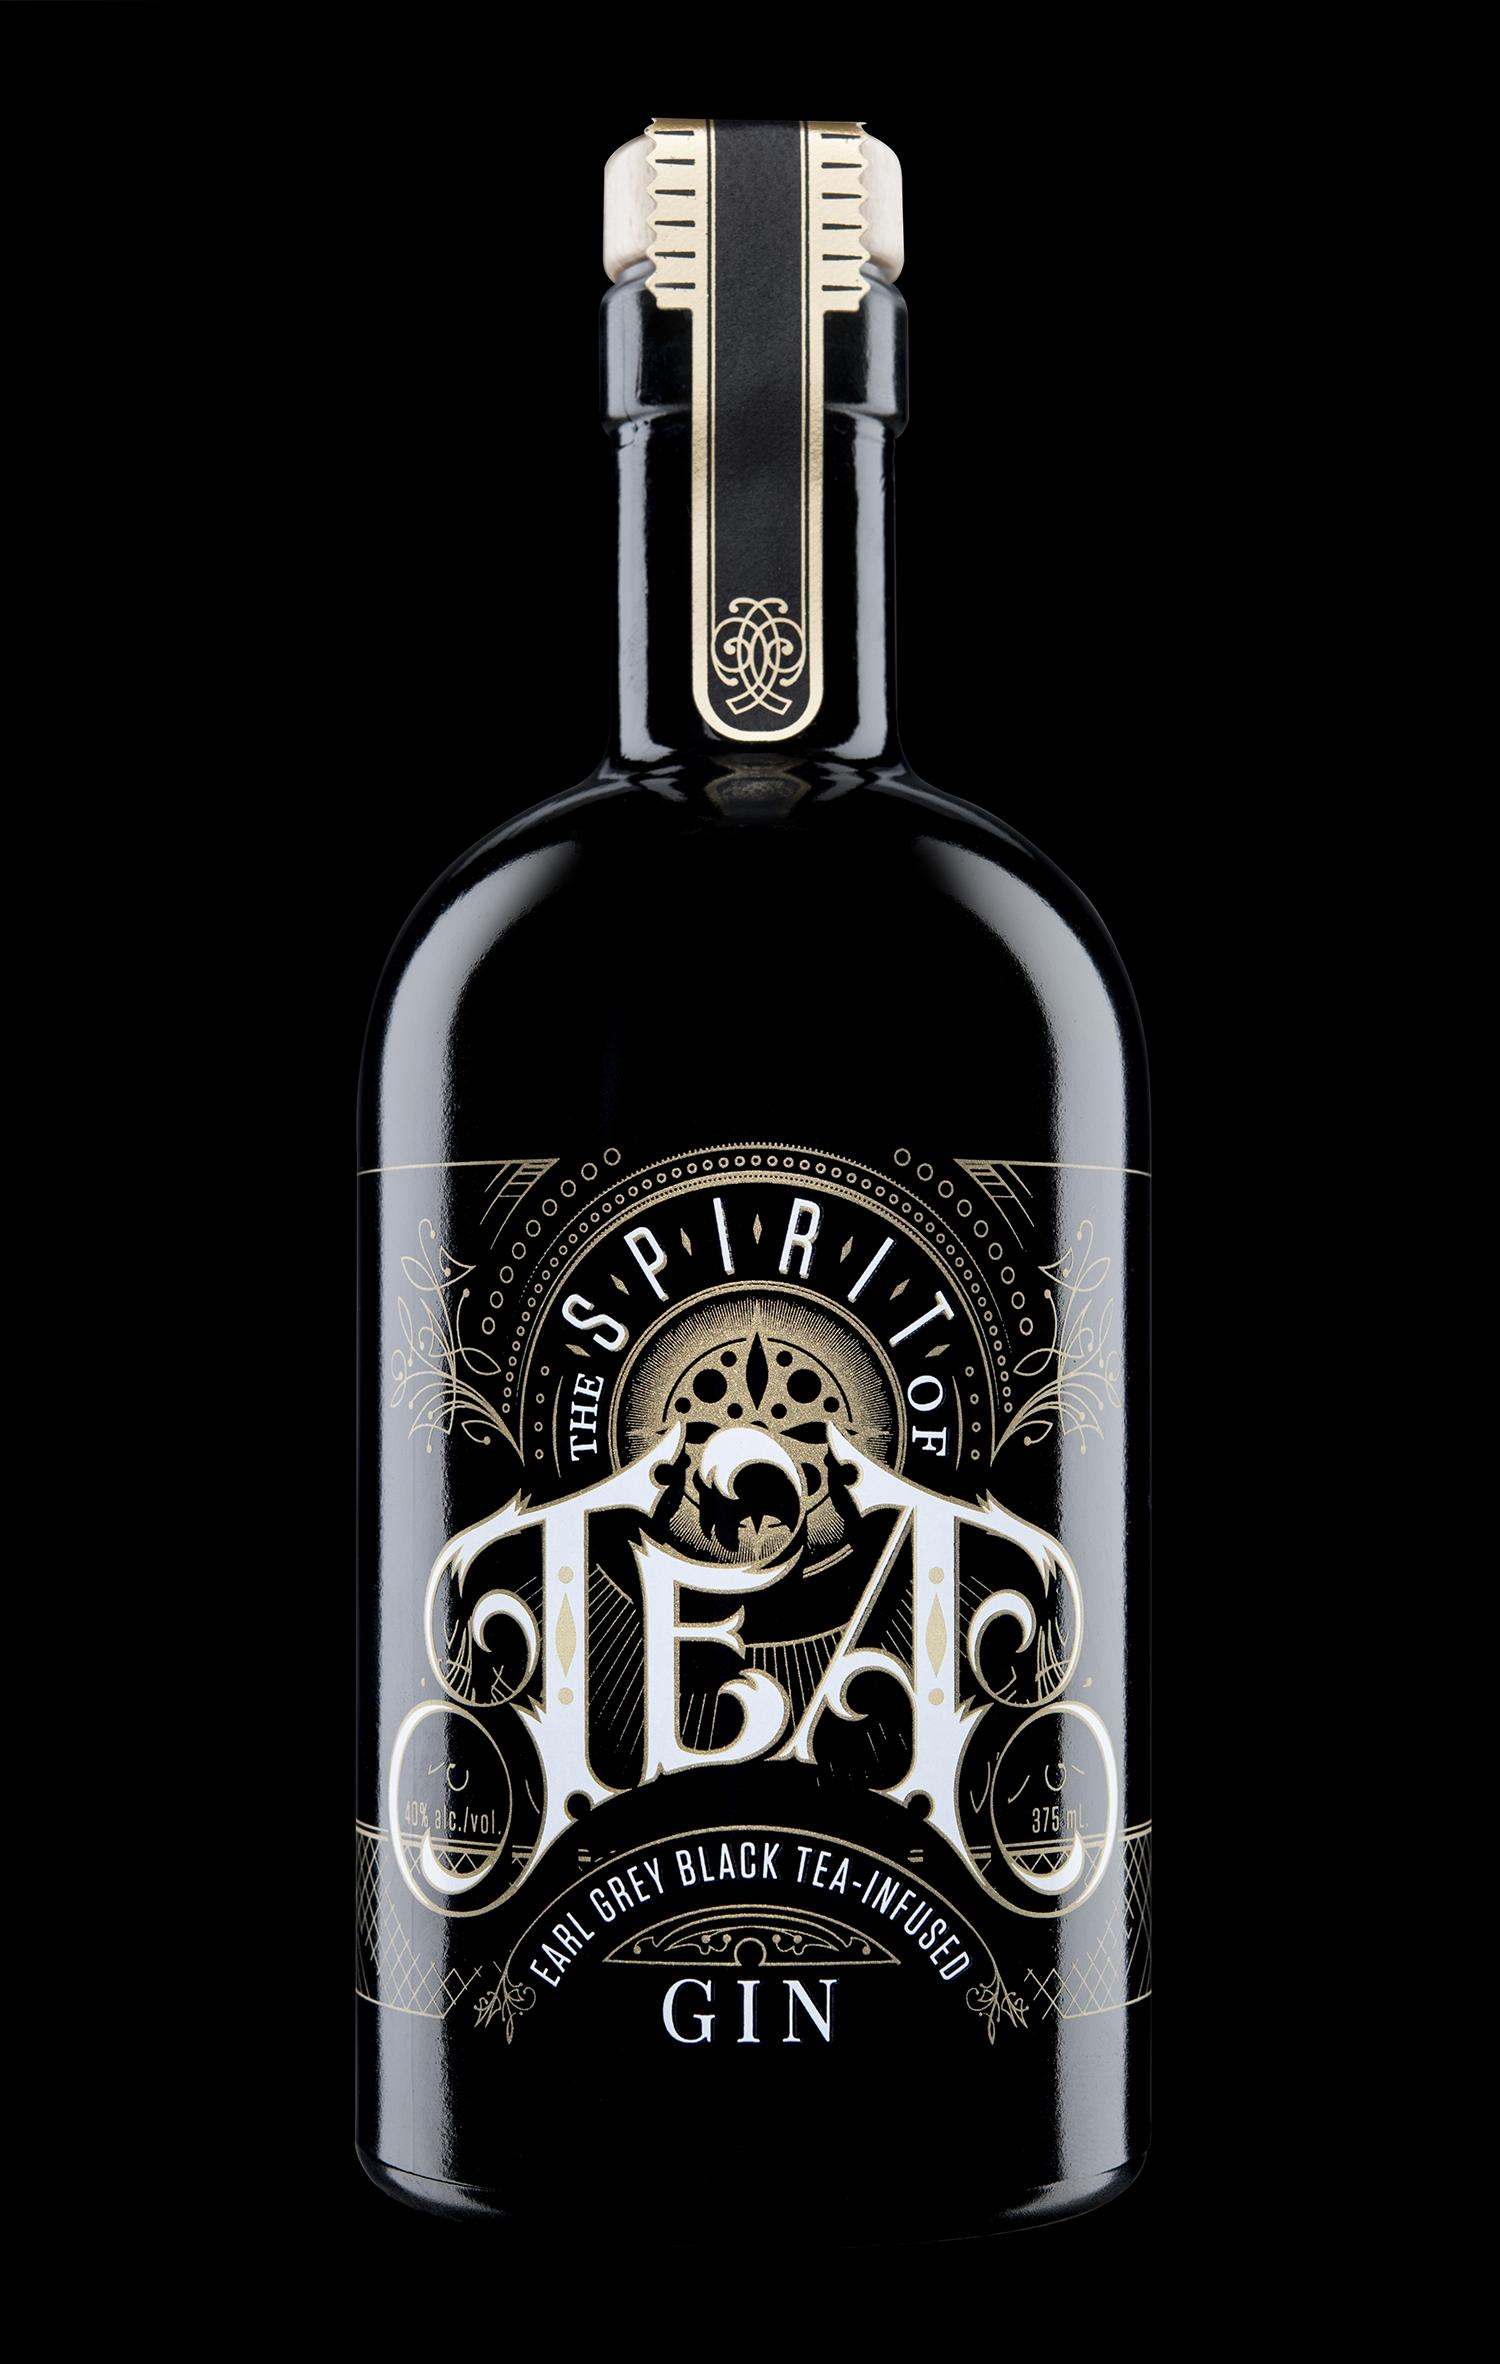 Branding and Packaging Design for The Spirit of Tea